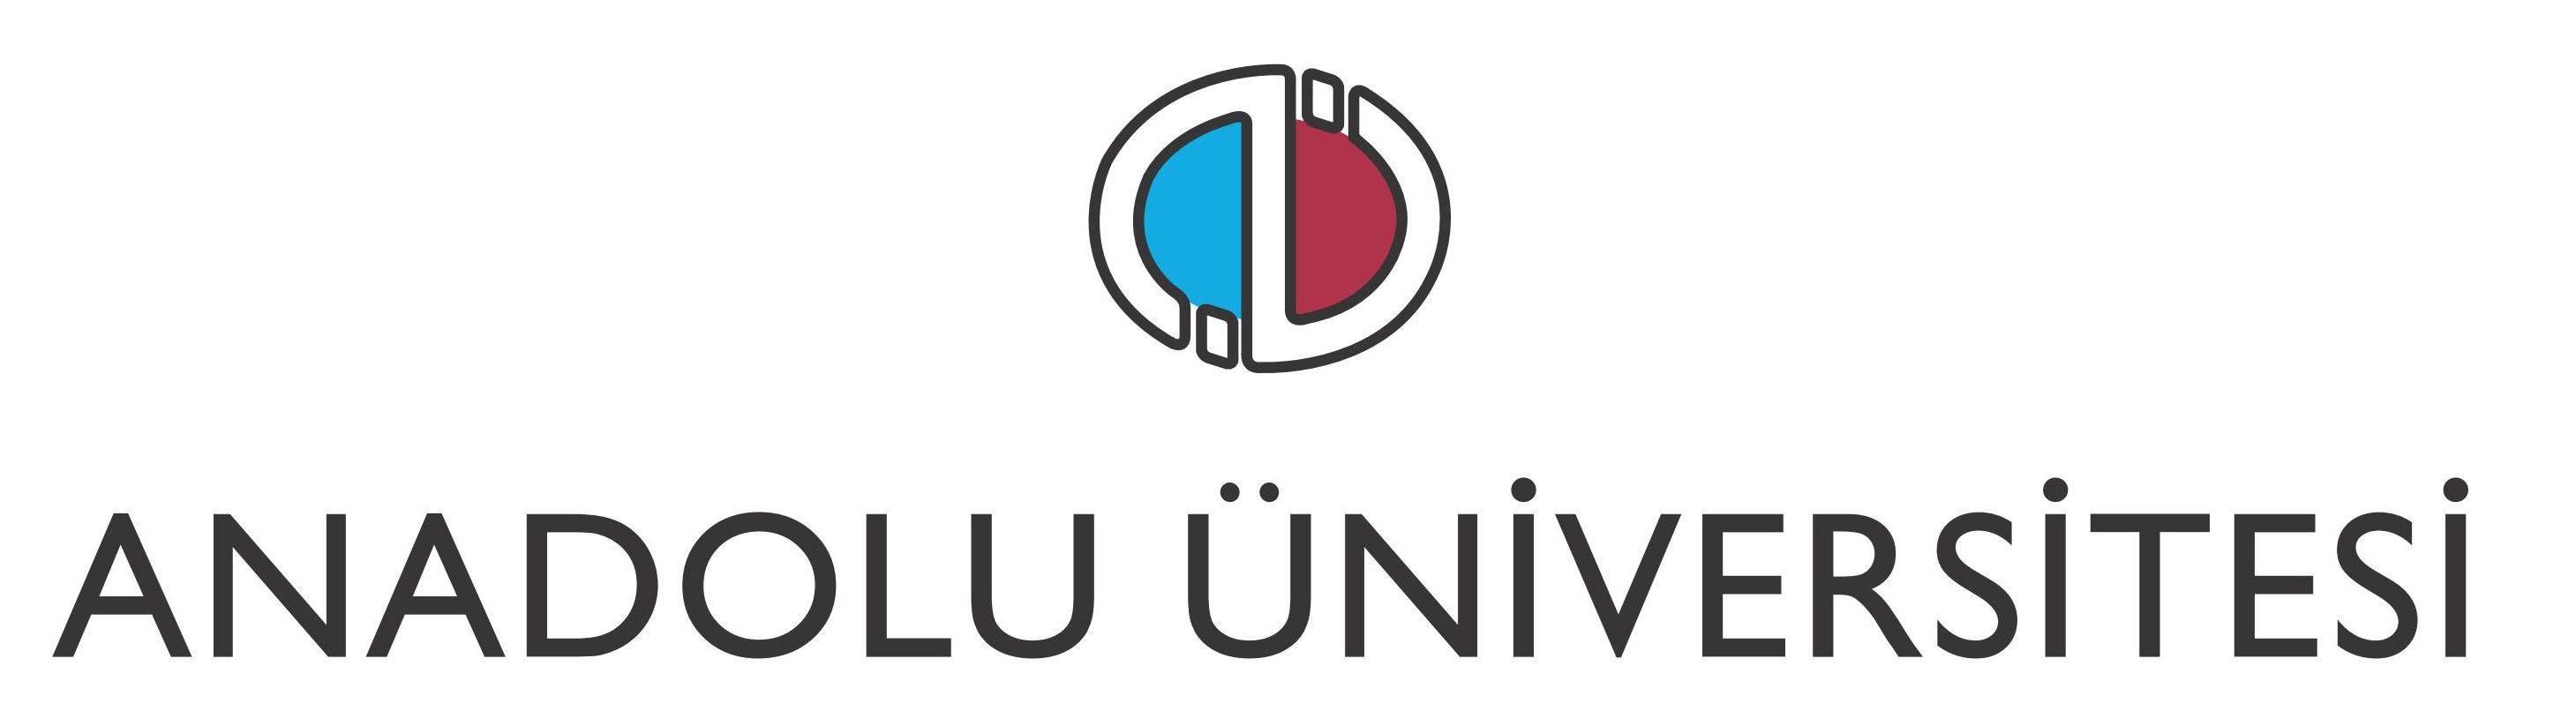 Anadolu Universitesi Eskisehir Logolari New Year Coloring Pages Logos Lululemon Logo